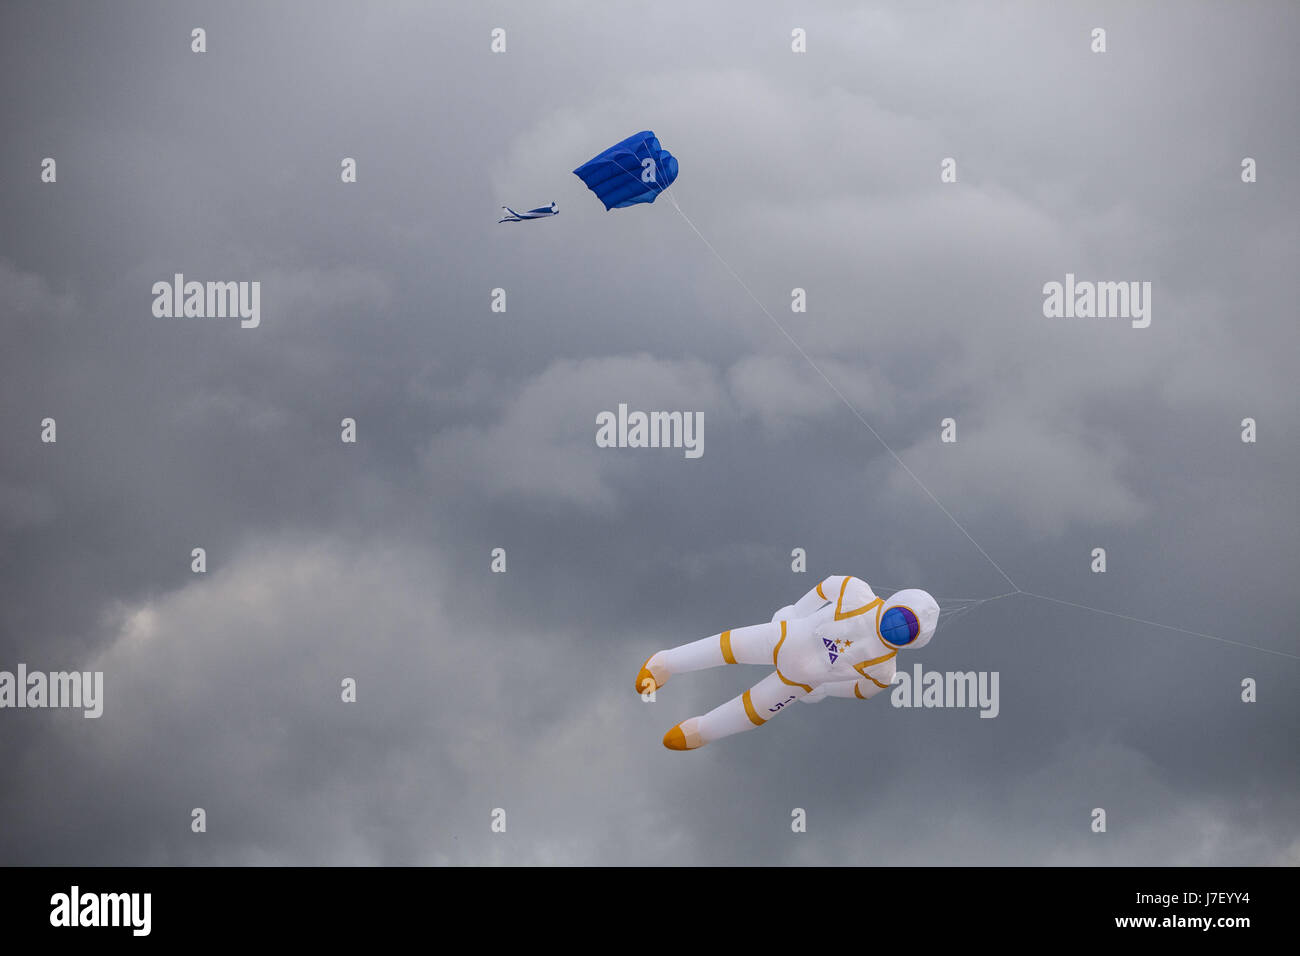 Berlin, Germany. 24th May, 2017. An astronaut shaped kite is seen flown over Tempelhofer feld (Tempelhof Park) in - Stock Image